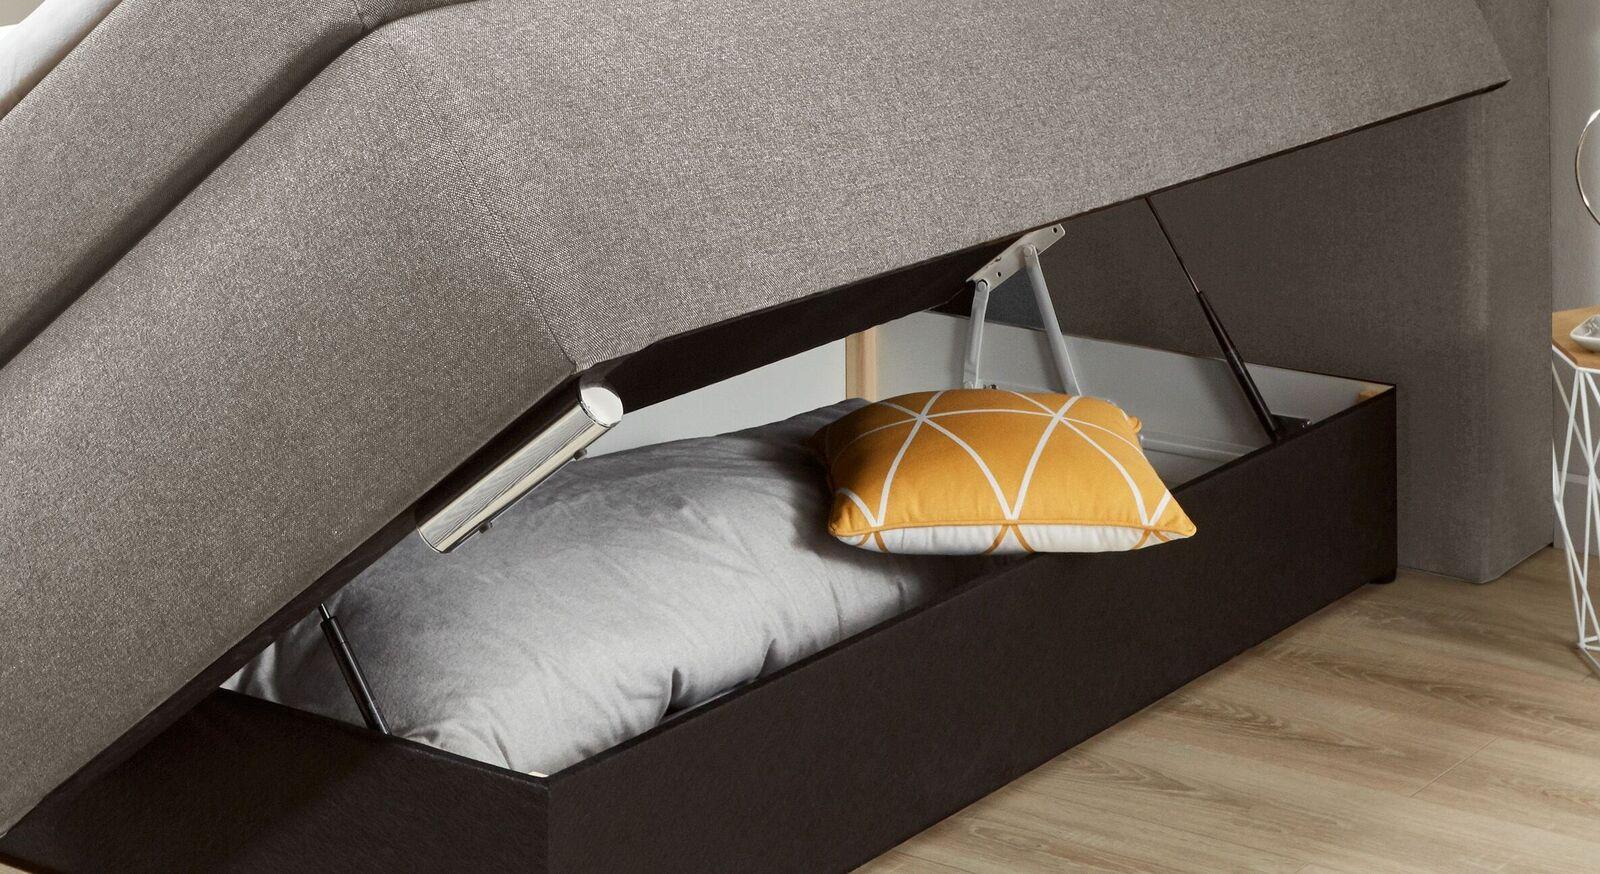 Boxspringbett Taruna mit Gasdruckfedern im Bettkasten